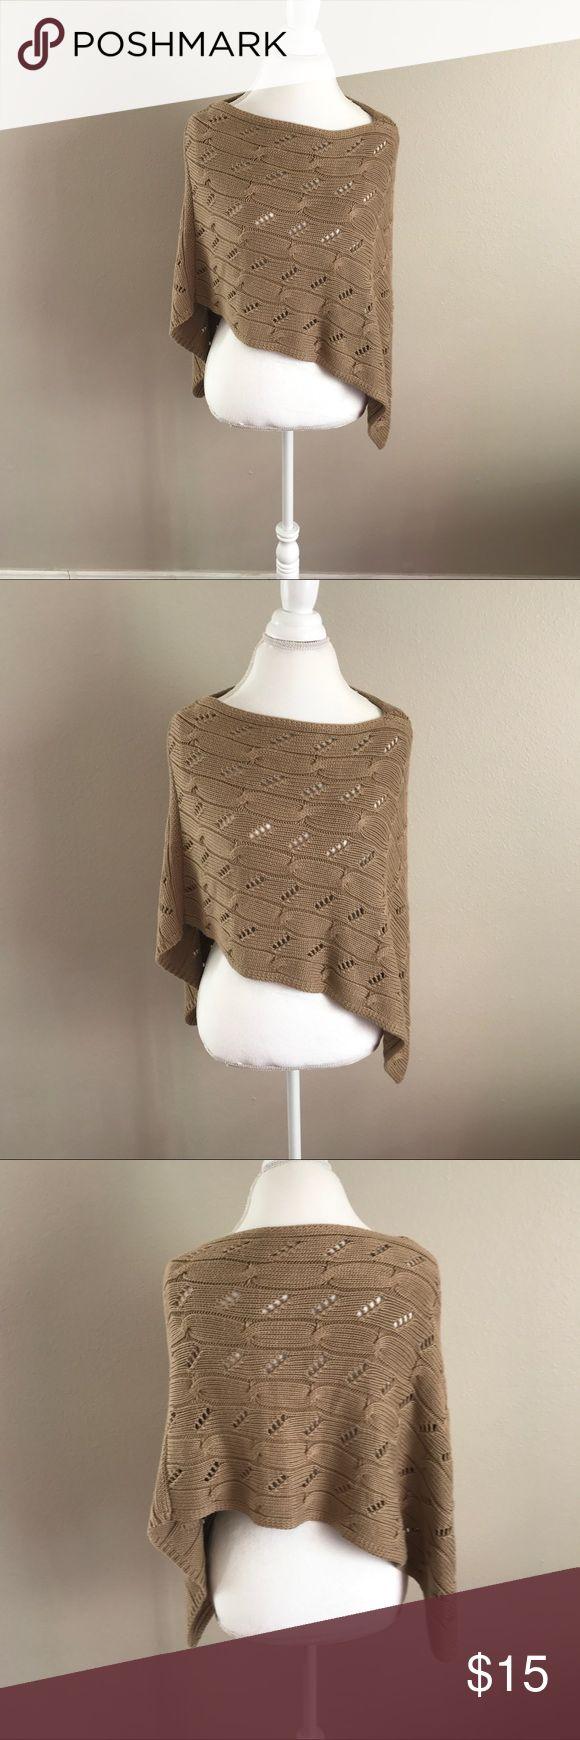 Ann Taylor Loft Sweater Shawl Ann Taylor Loft Sweater Shawl. One Size. Like new condition. LOFT Sweaters Shrugs & Ponchos